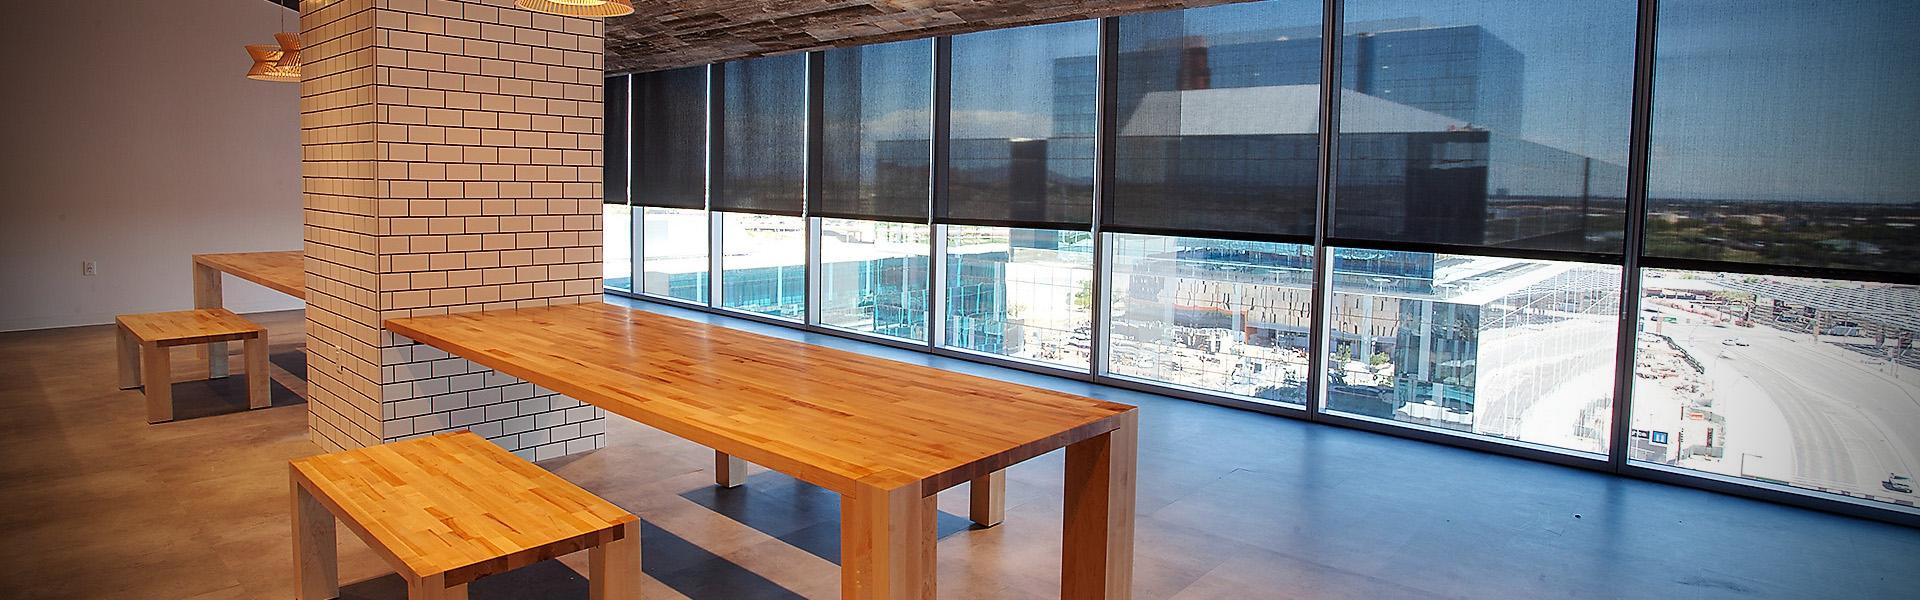 hight resolution of clutch xd flexshades marina heights tempe az dealer progressive commercial interiors